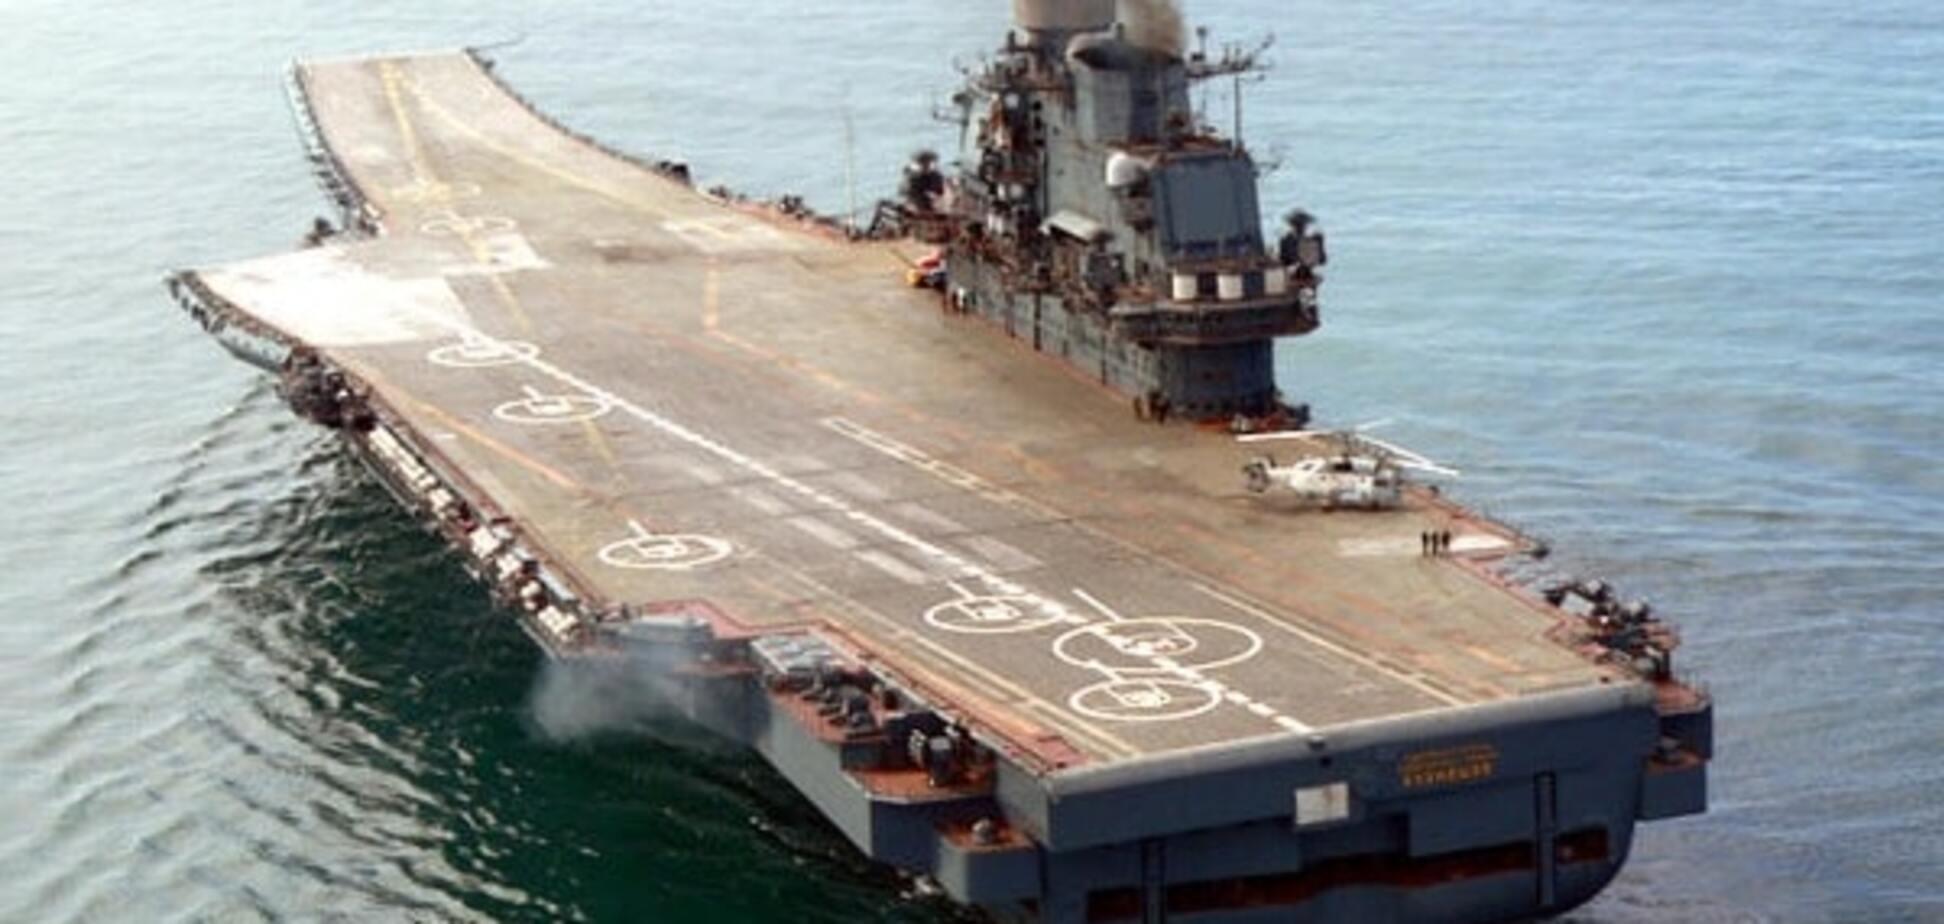 адмирал кузнецов крейсер